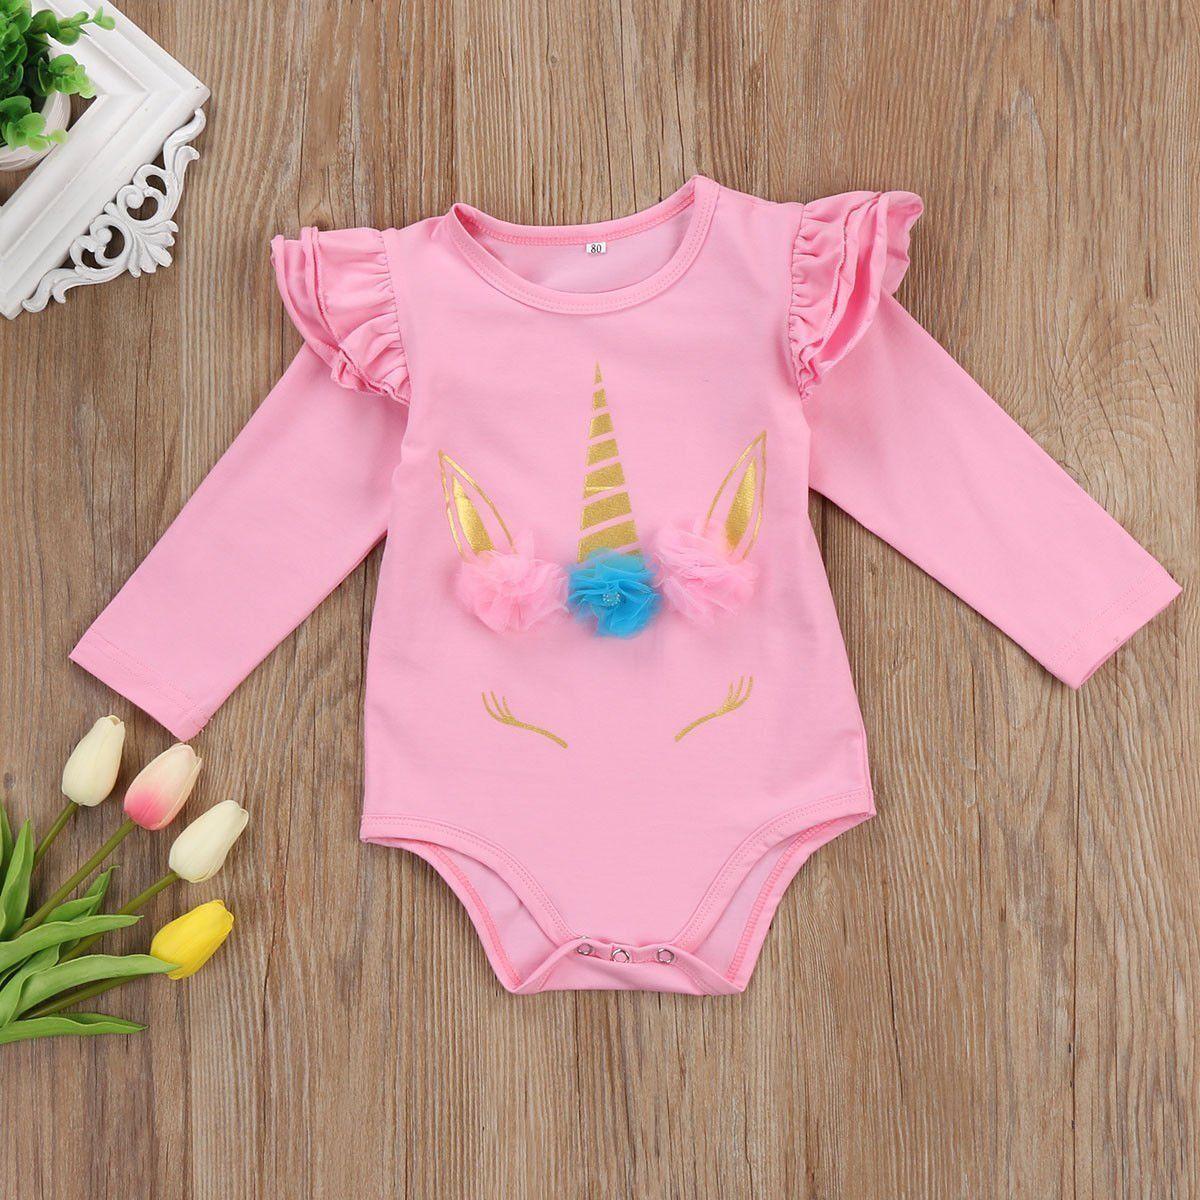 f2f01cecc75e Newborn Baby Girl Unicorn Romper Cotton Bodysuit Summer Clothes Outfits  Pink Lot